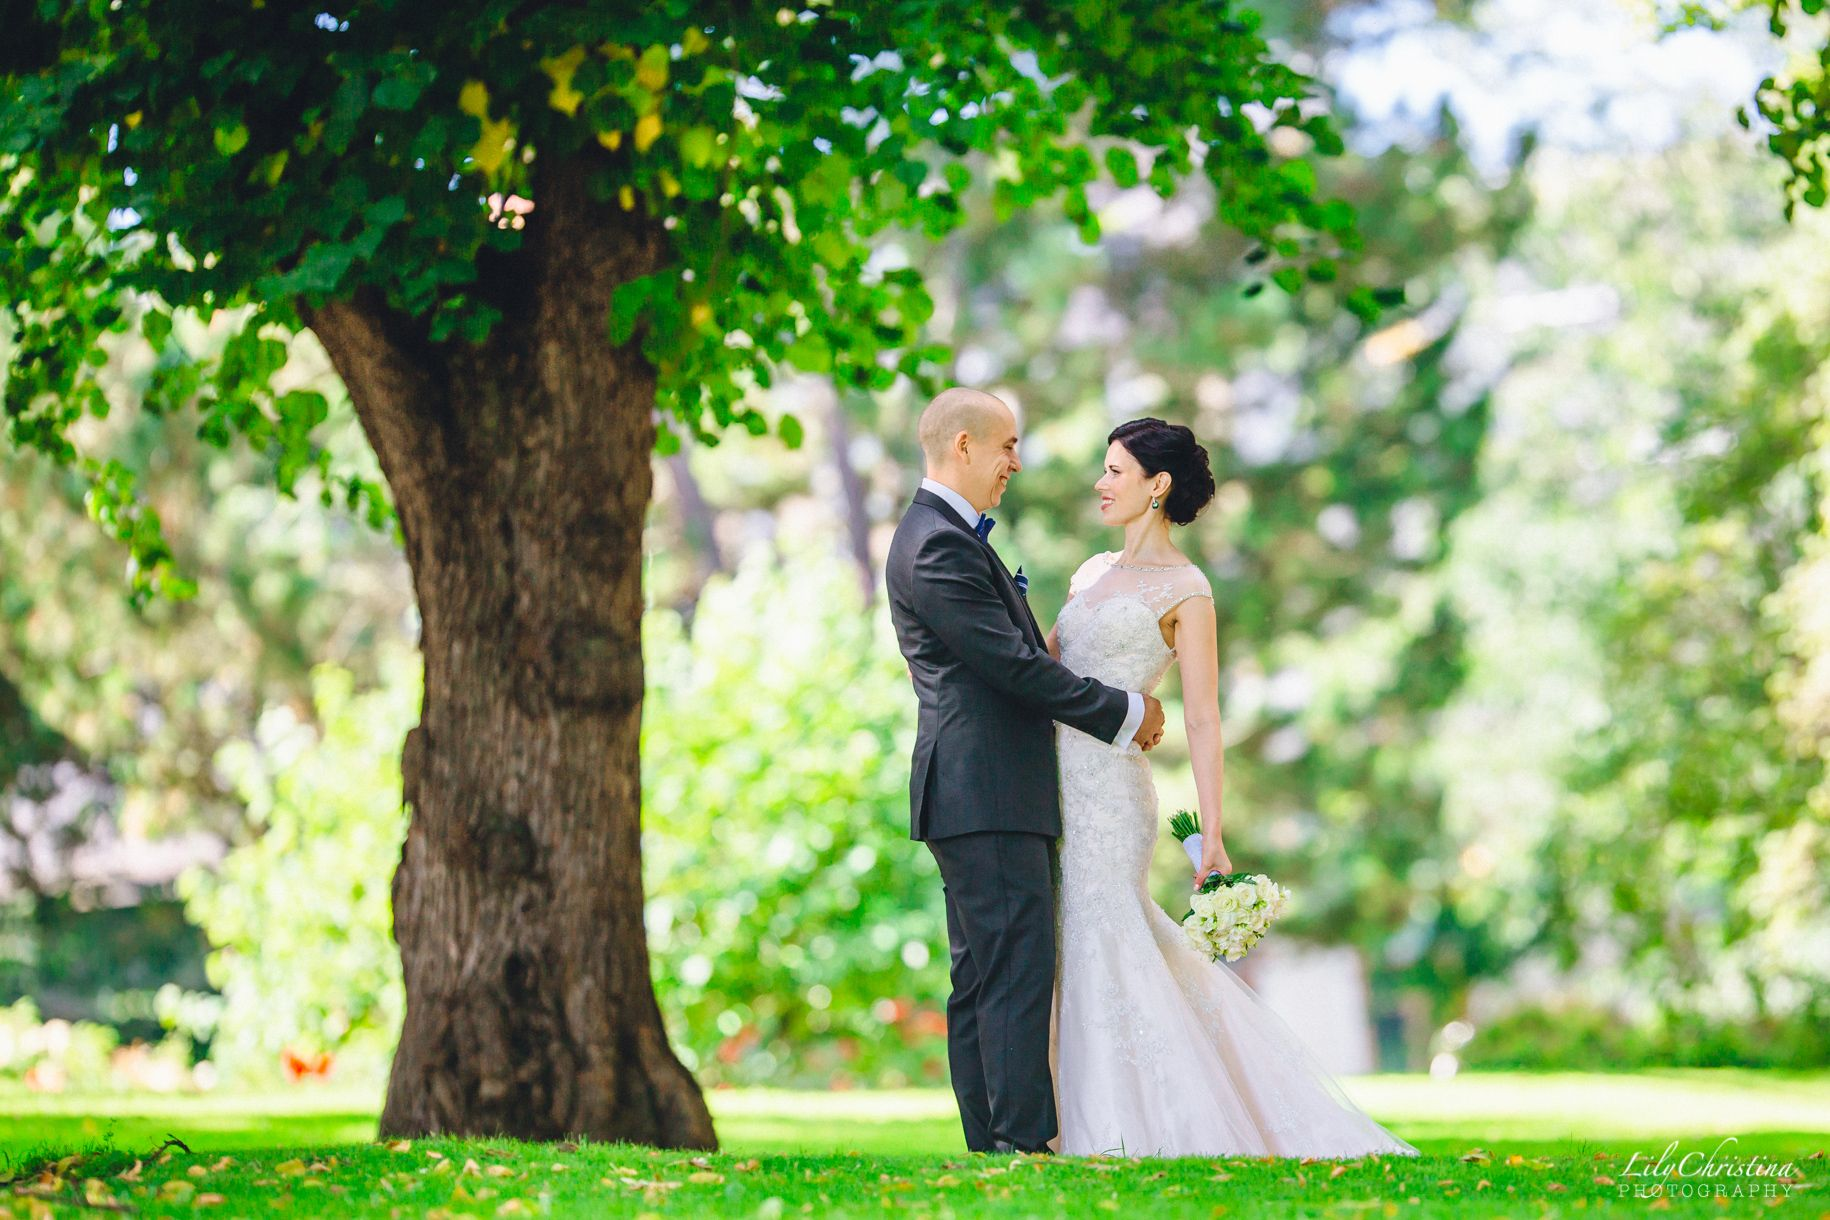 hääkuvaus, wedding photography, weddings, weddings photographer, wedding portrait, hääkuva, häät, bridesmaids, bride, groom, hääpotretti